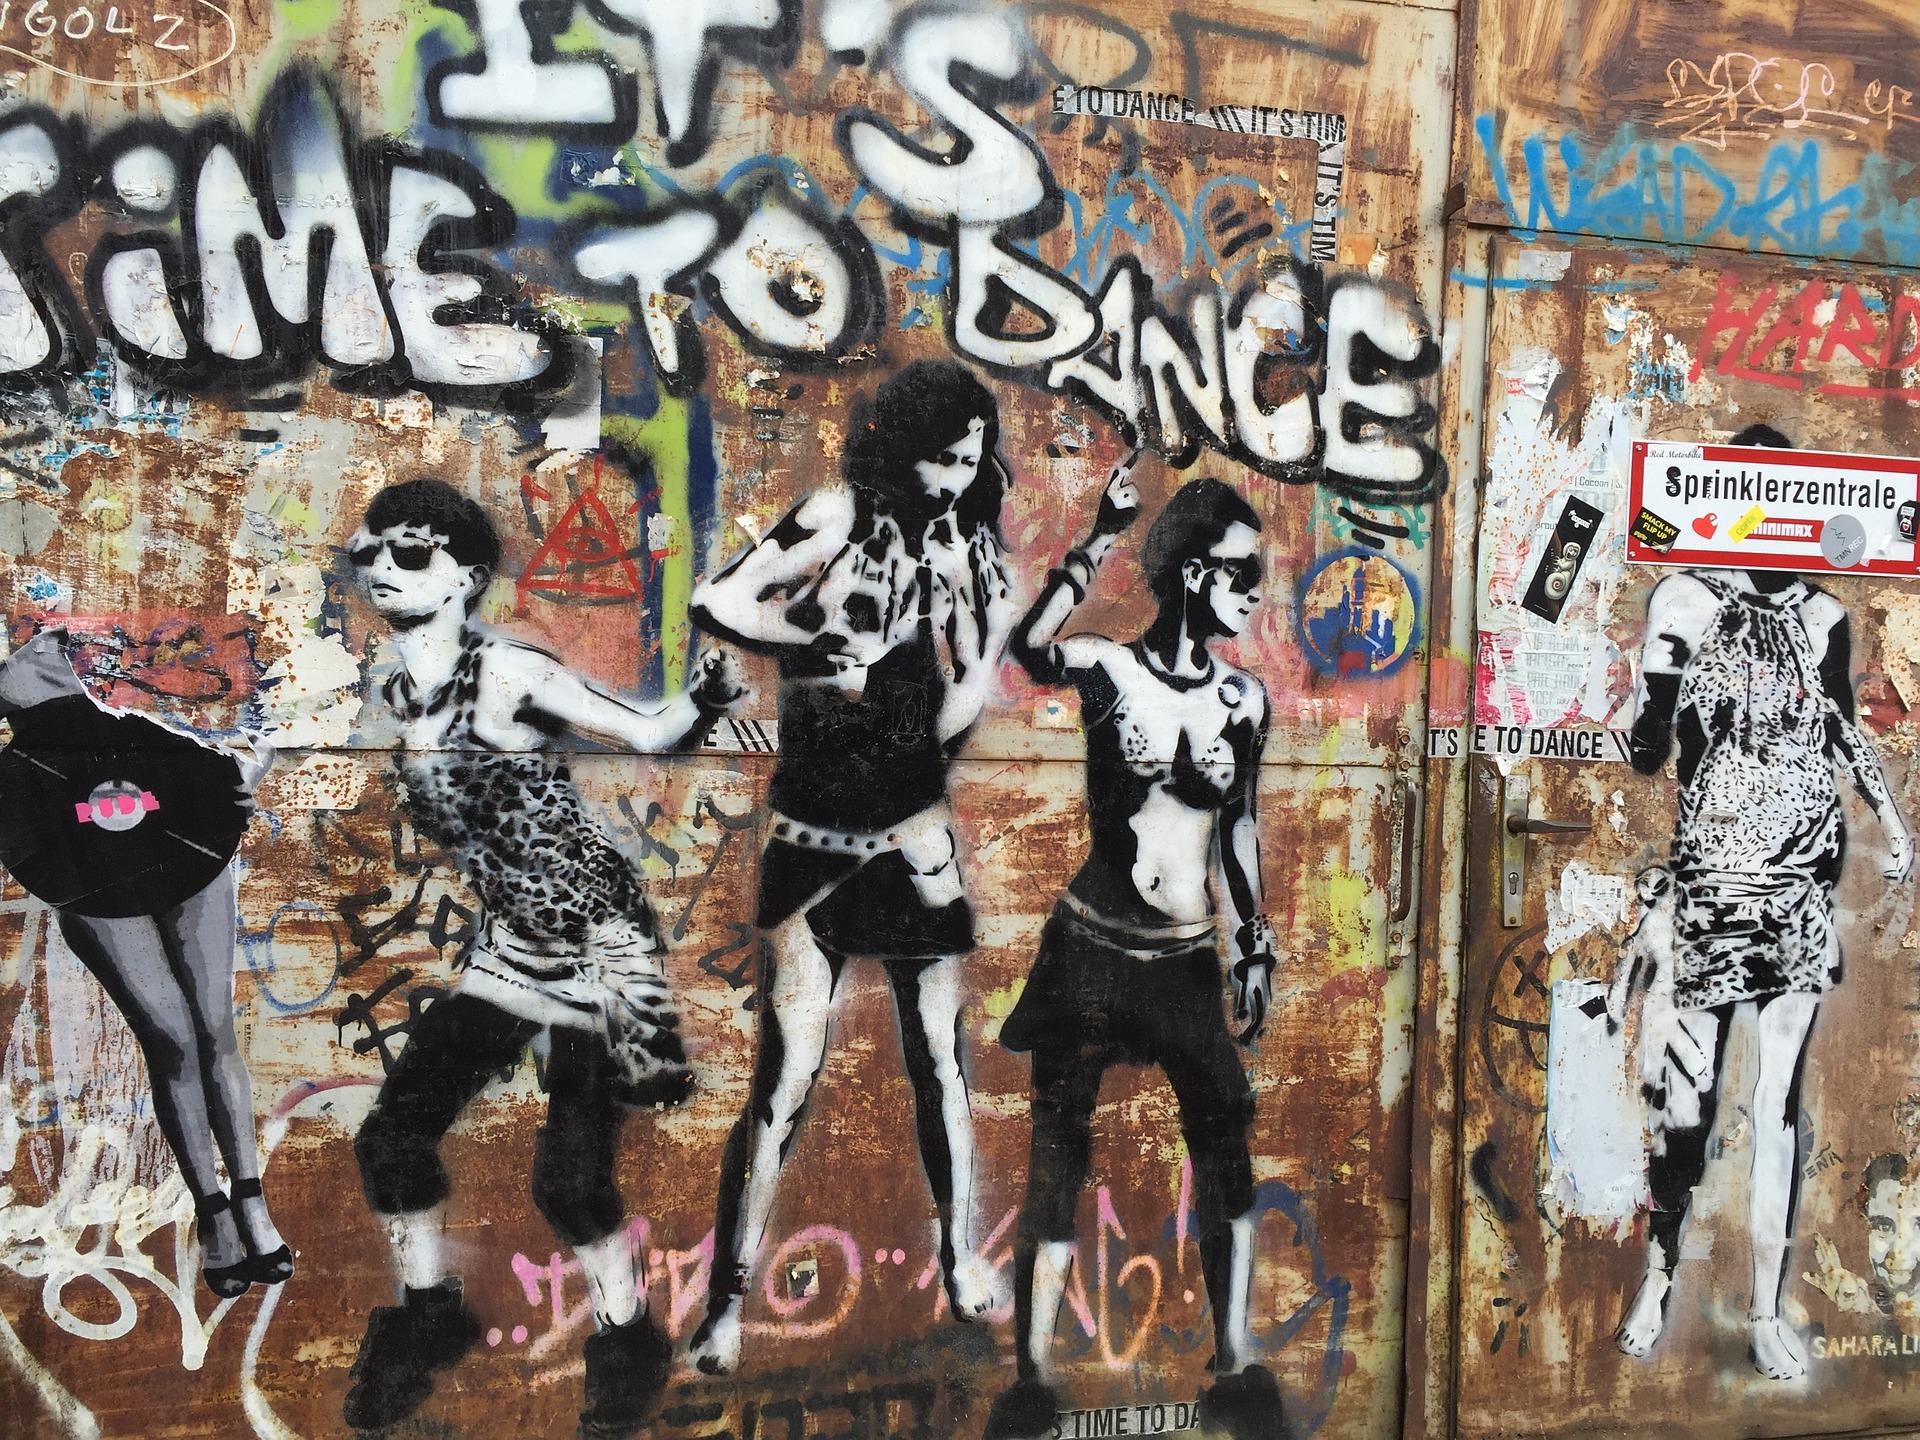 Grafitti And Street Art In Berlin